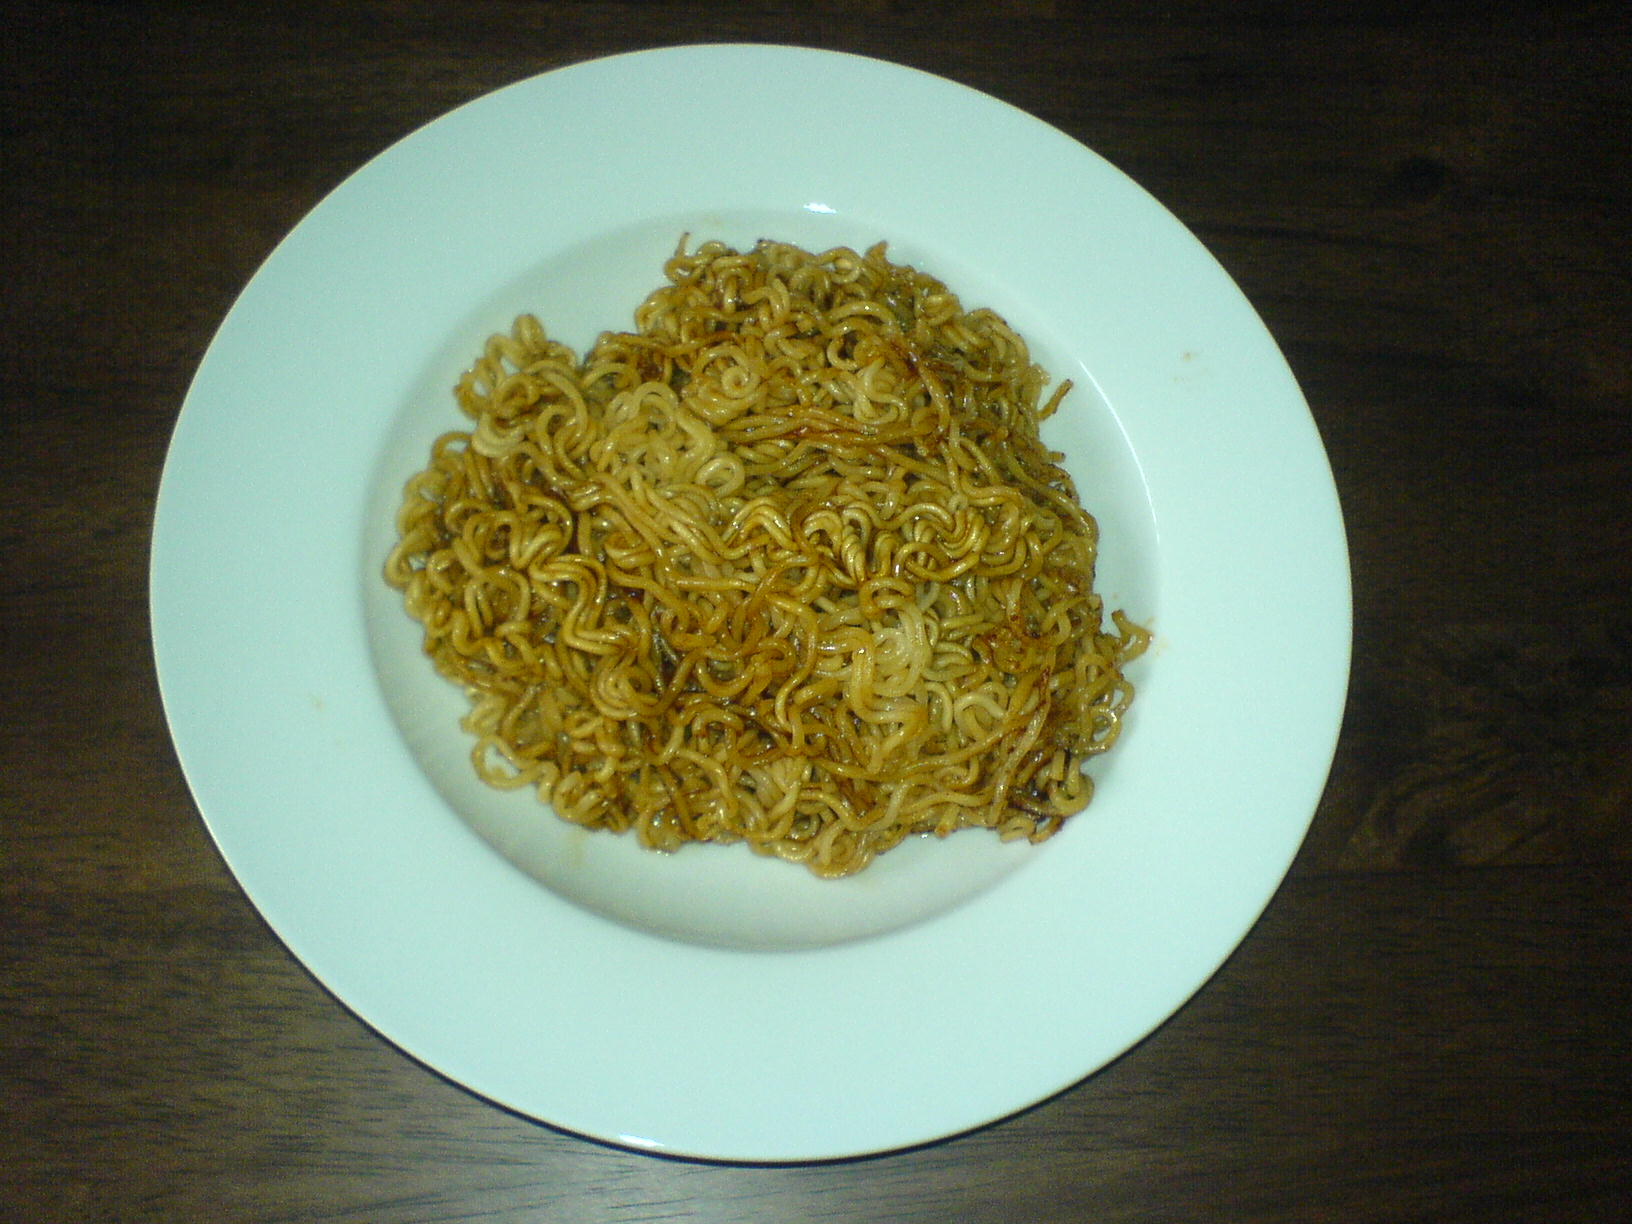 http://foodloader.net/Holz_2011-01-09_Asianudeln.jpg